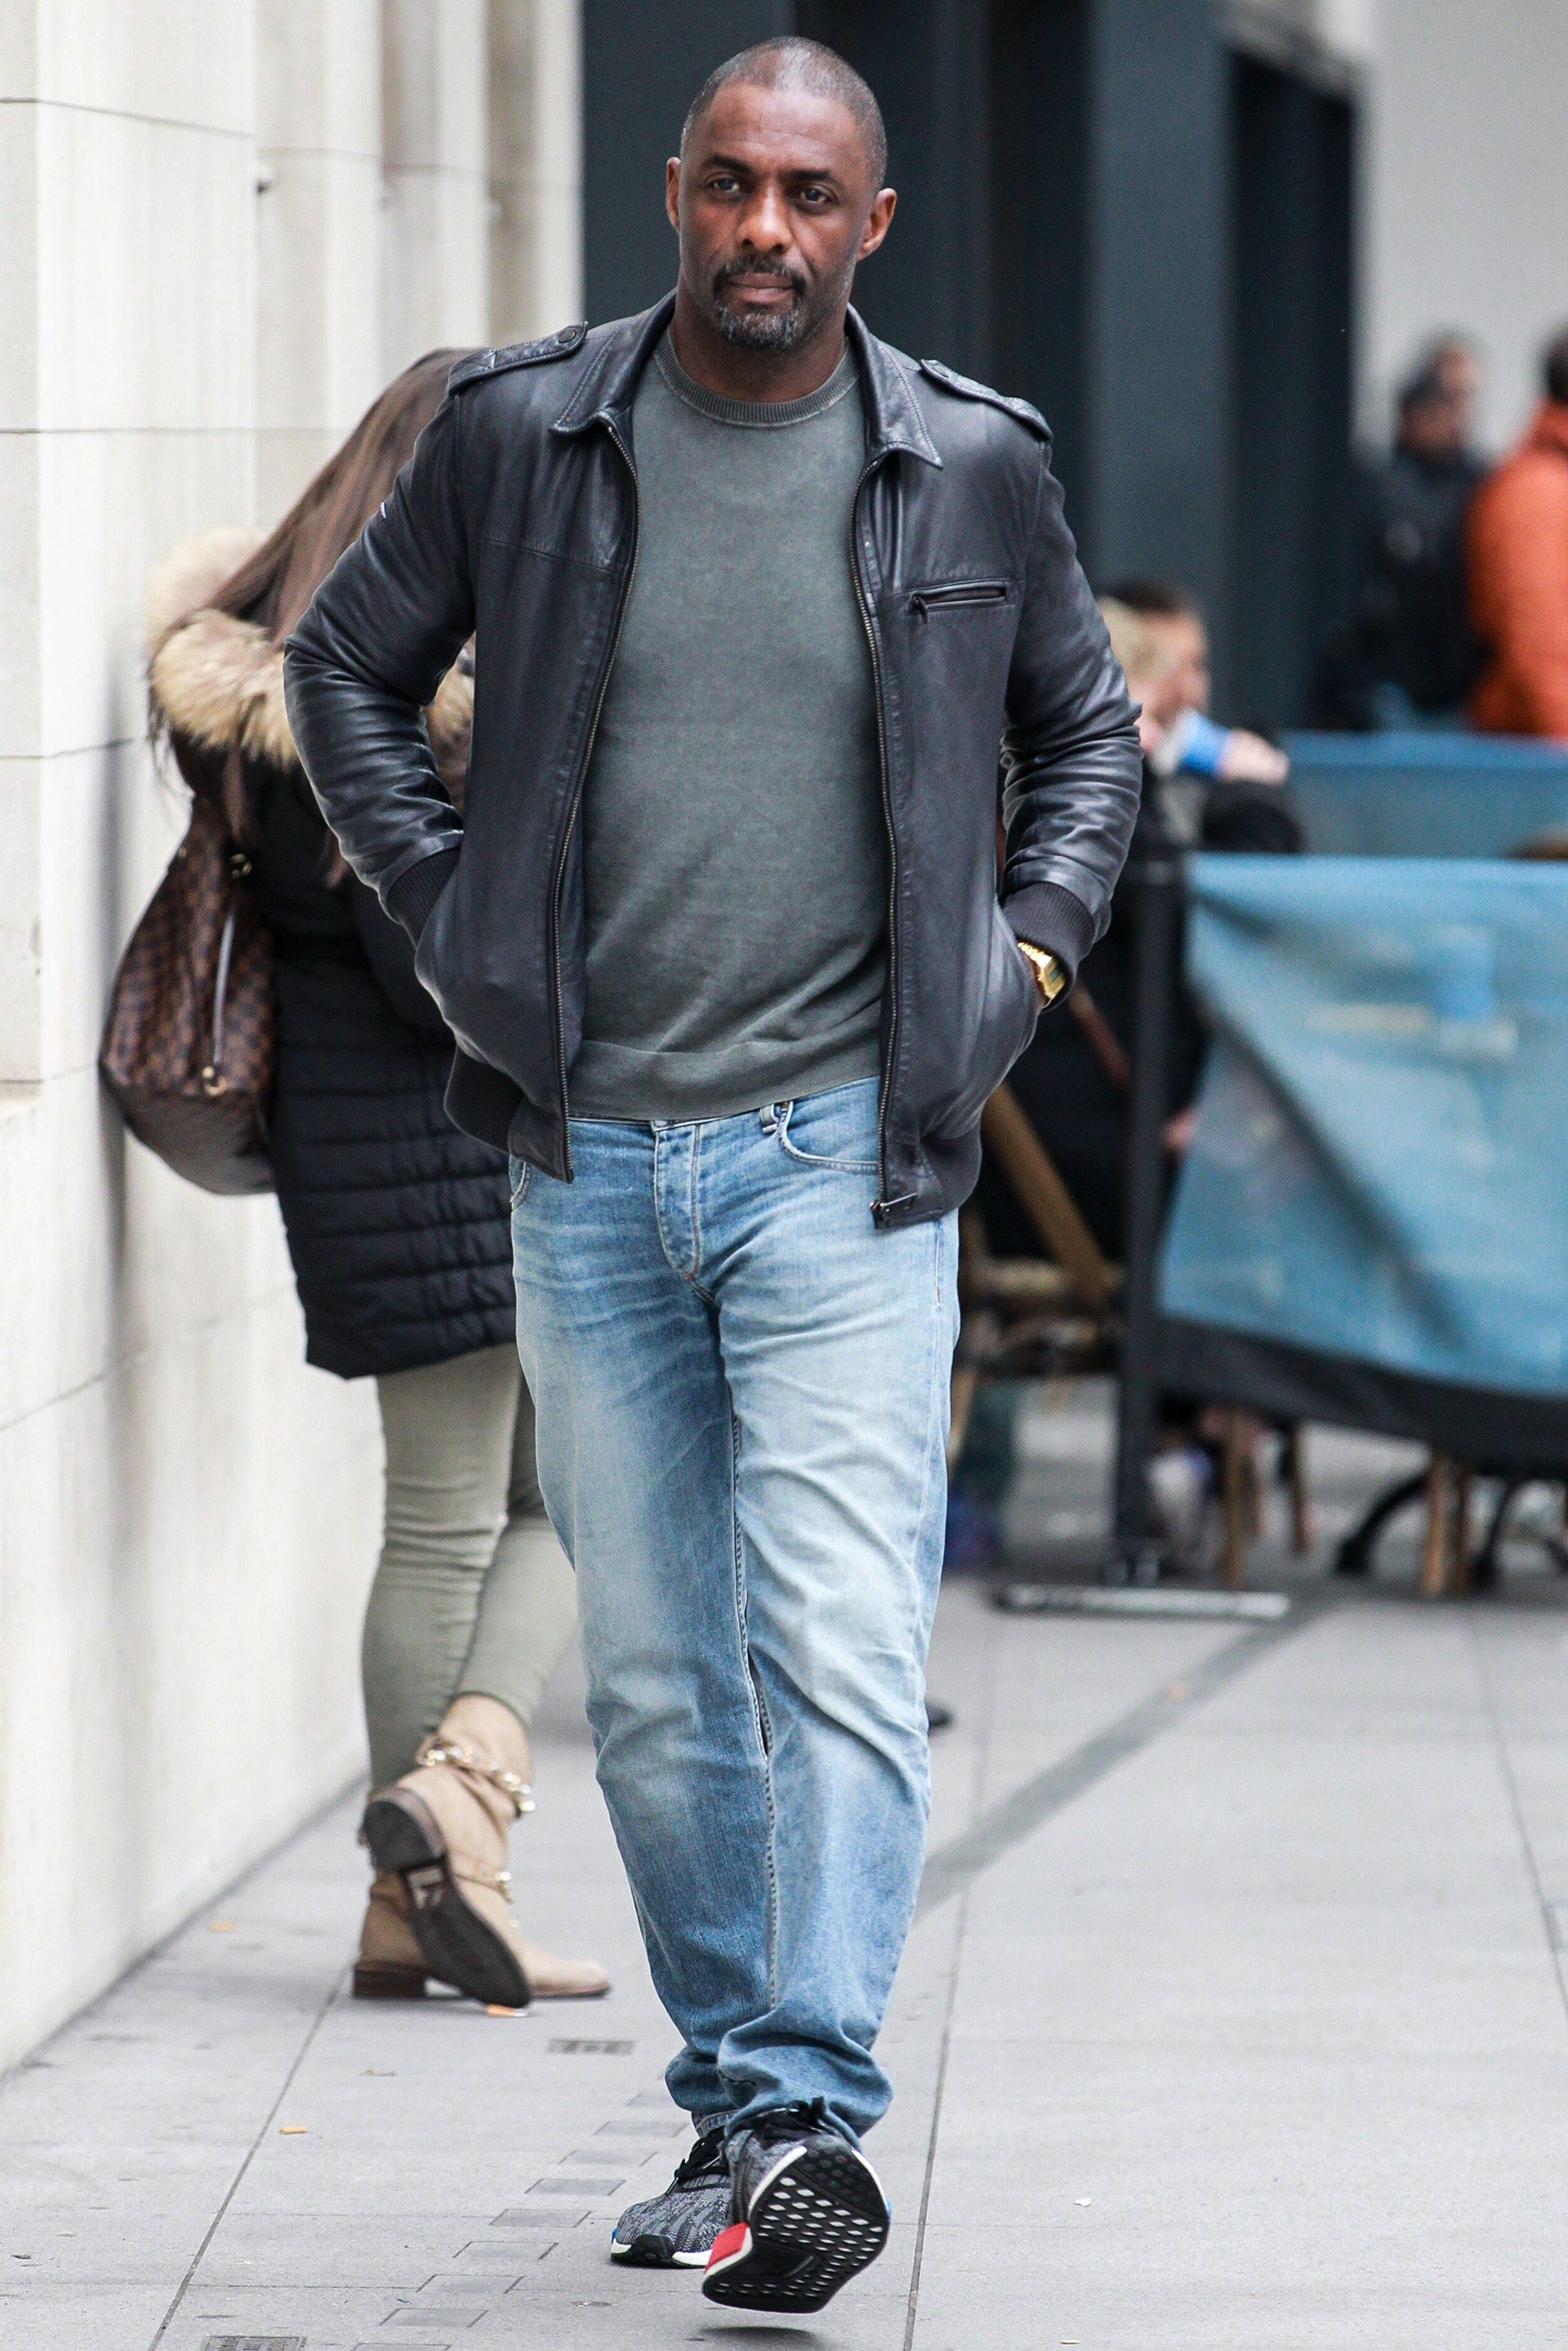 The Idris Elba Lookbook   david   Pinterest   Idris elba, Elba and ...